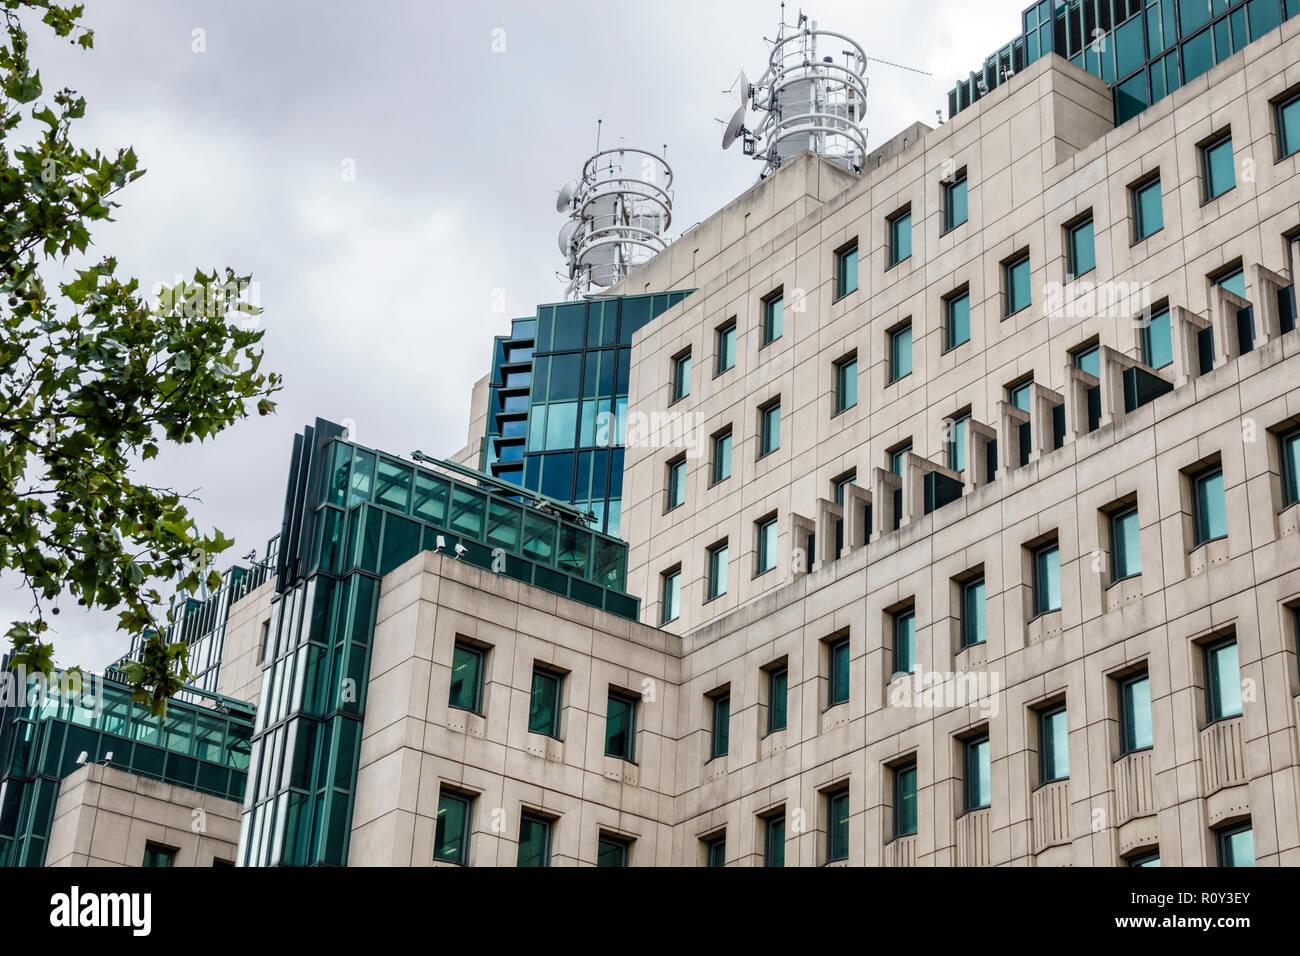 London England United Kingdom Great Britain Lambeth Vauxhall MI6 Counter Terrorism Command CTC SO15 Specialist Operations branch London's Metropolitan - Stock Image